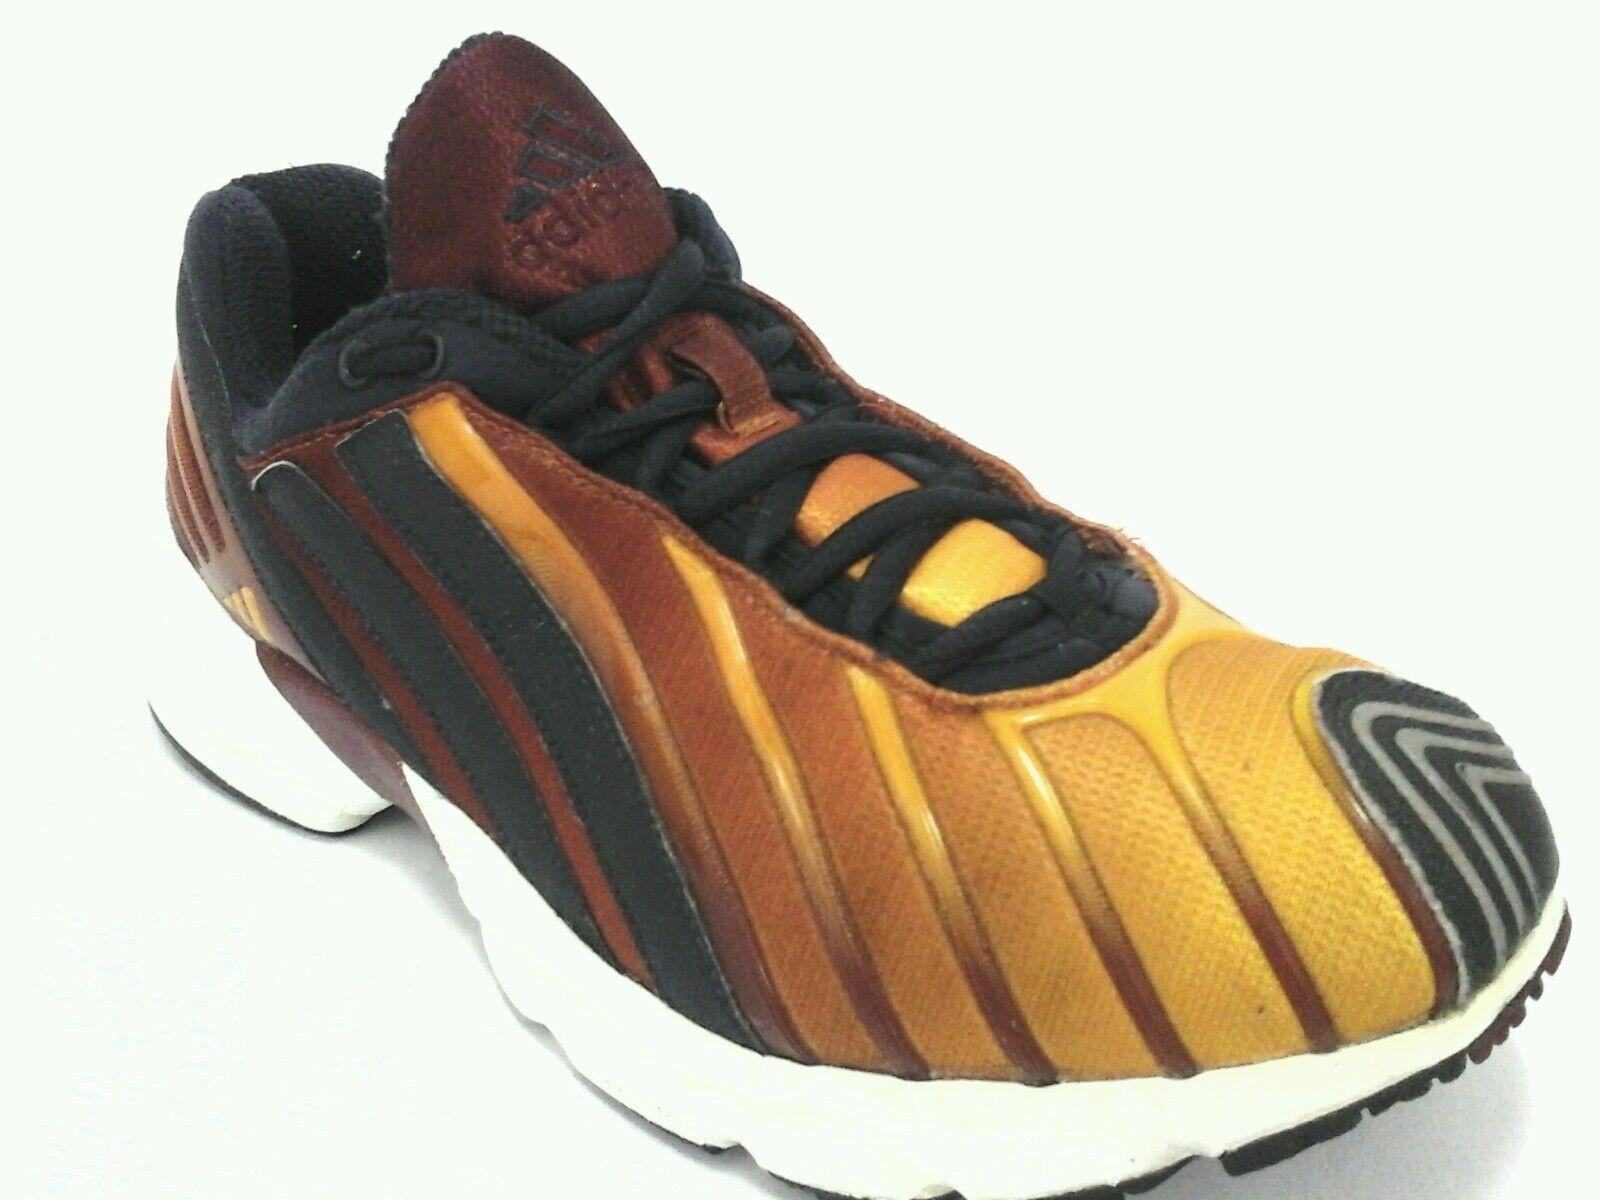 9eeaa2e2a9744 ... ADIDAS ADIDAS ADIDAS Shoes SPECTRUM Running Sneakers Gold Black Women s  US 8 RARE 2b4de3 ...